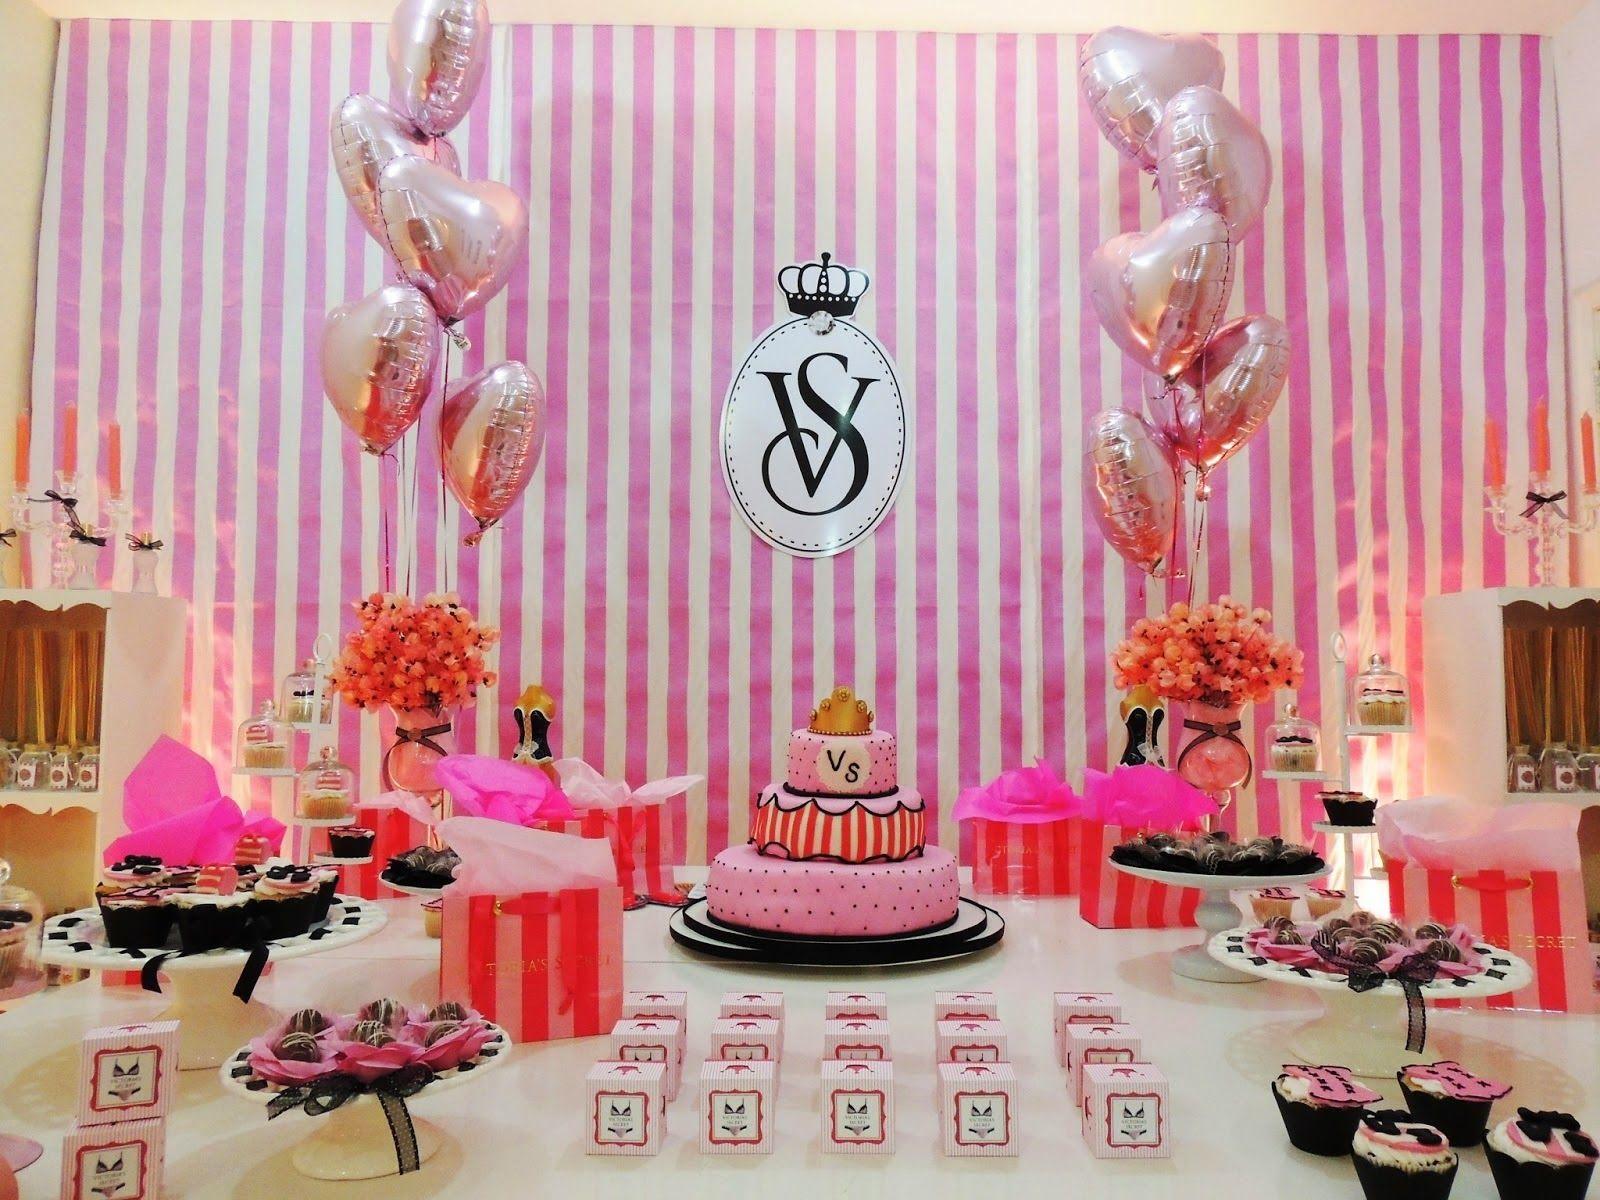 Google themes pink and black - Festa Com Tema Victoria Secrets Pesquisa Google